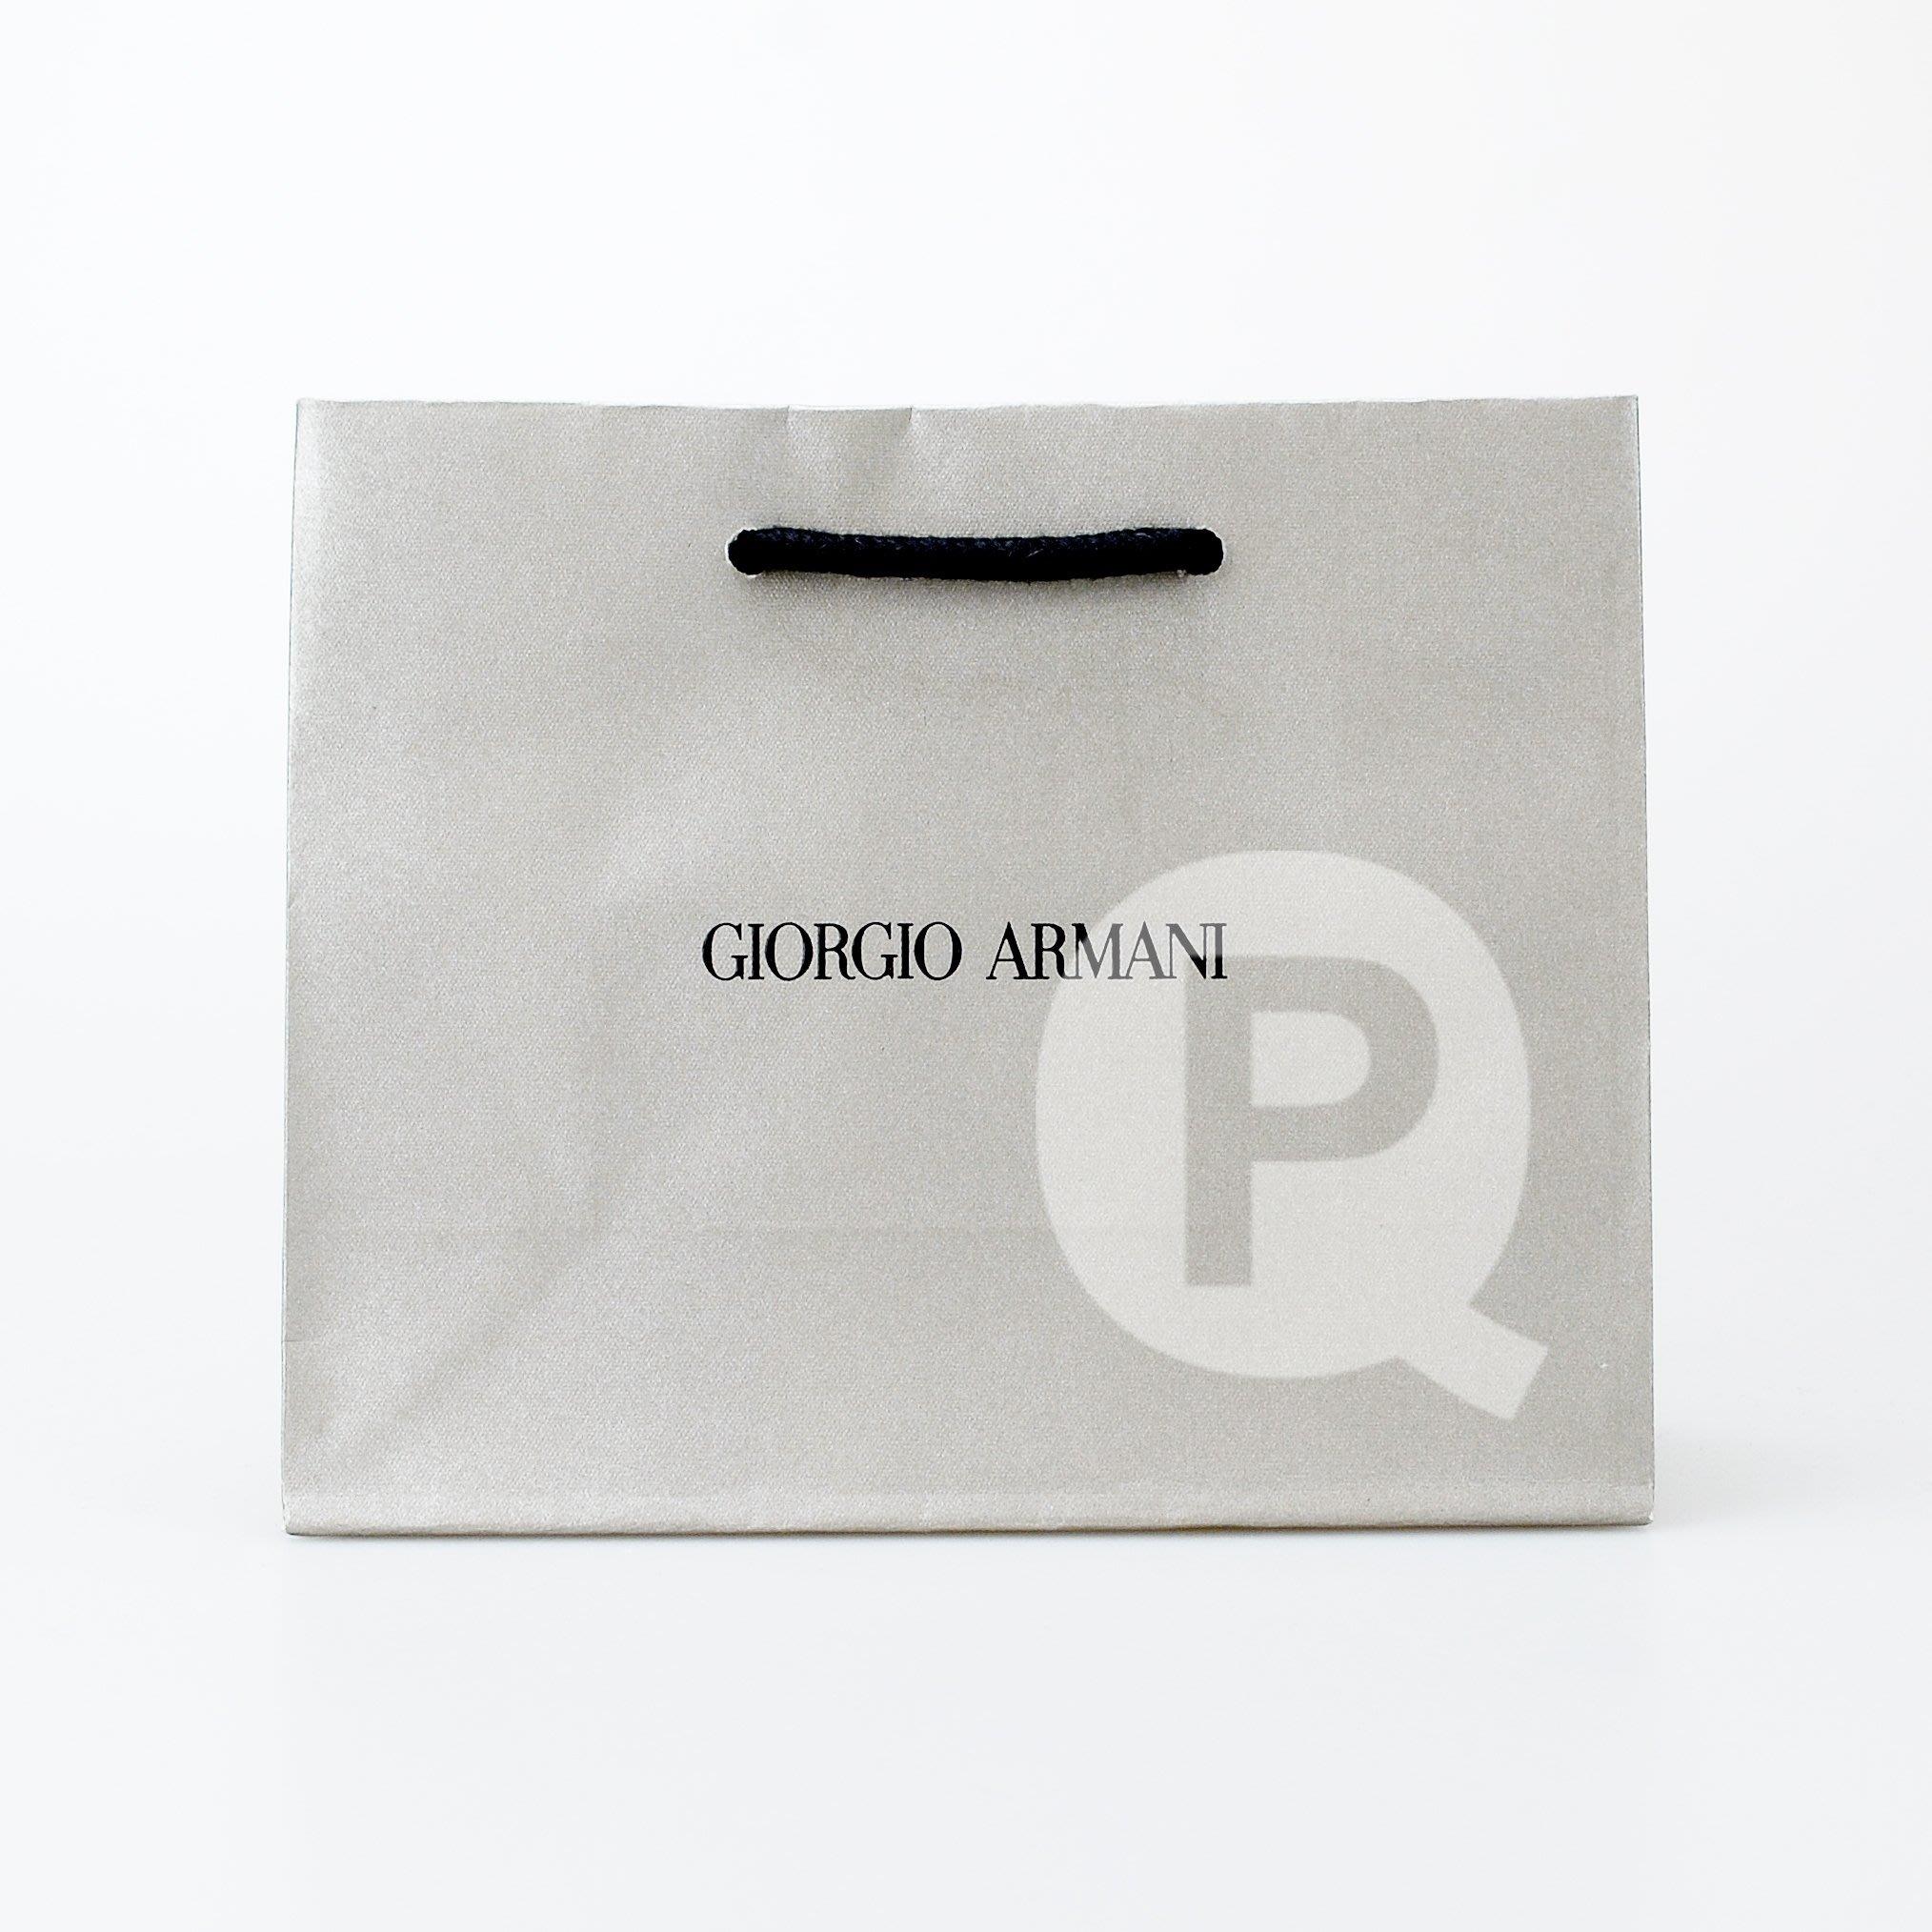 GIORGIO ARMANI 精品品牌紙袋 (13*5.5*10.5cm) 迷你 【芭樂雞】